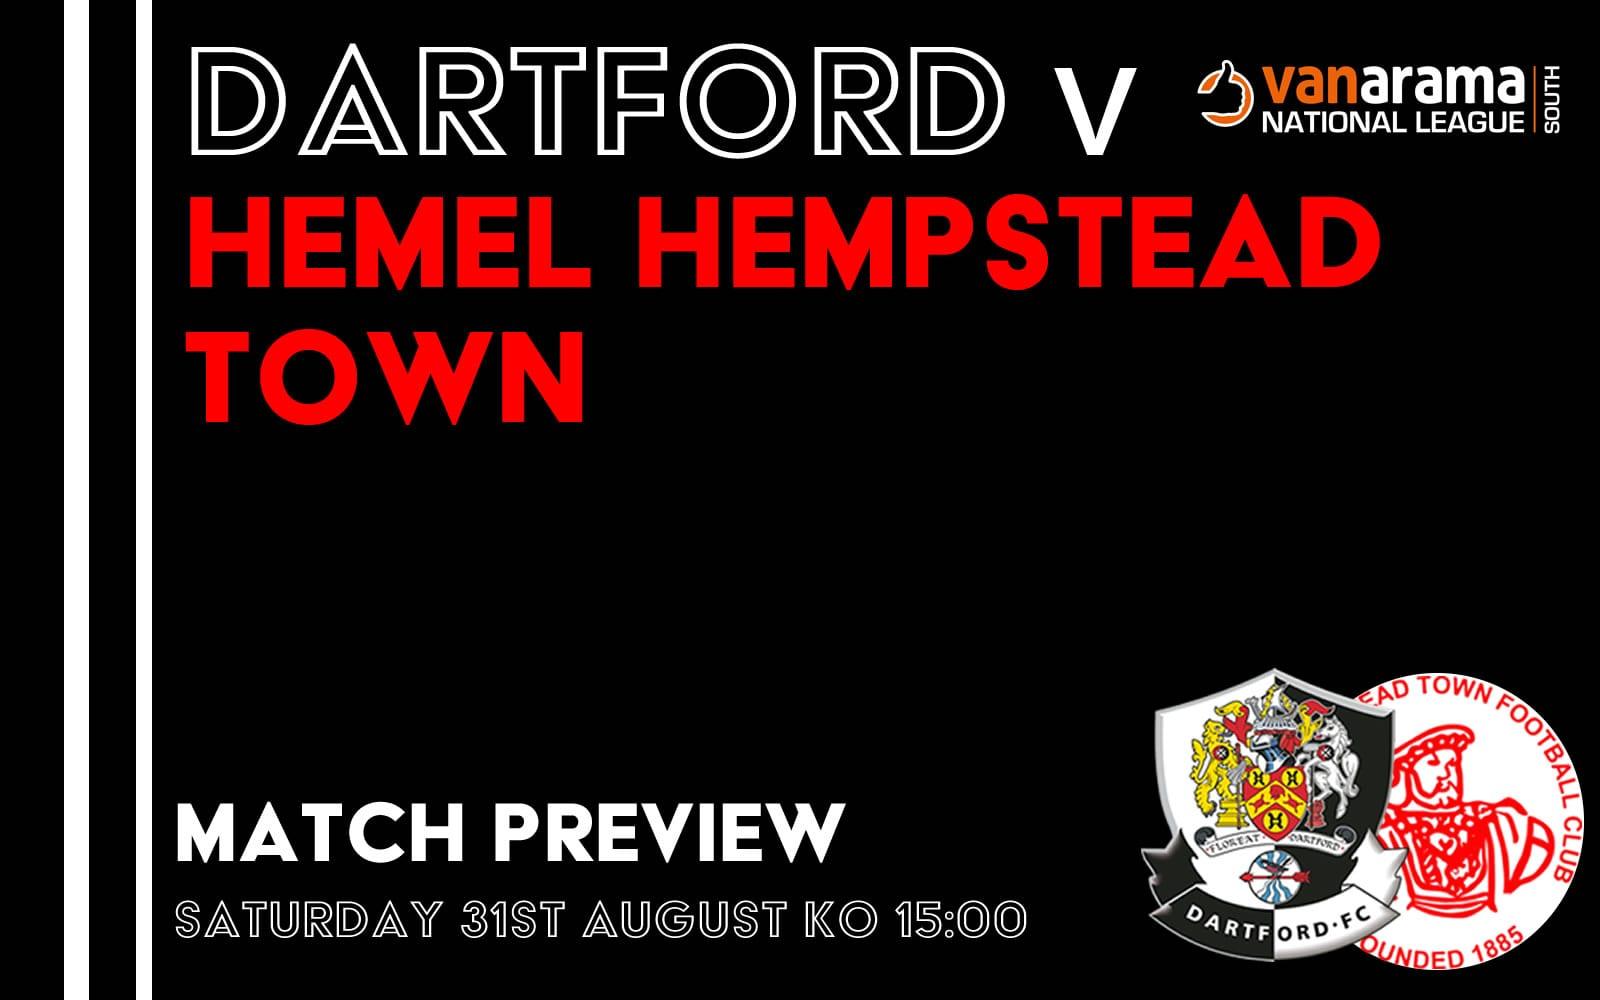 Dartford v Hemel Hempsted